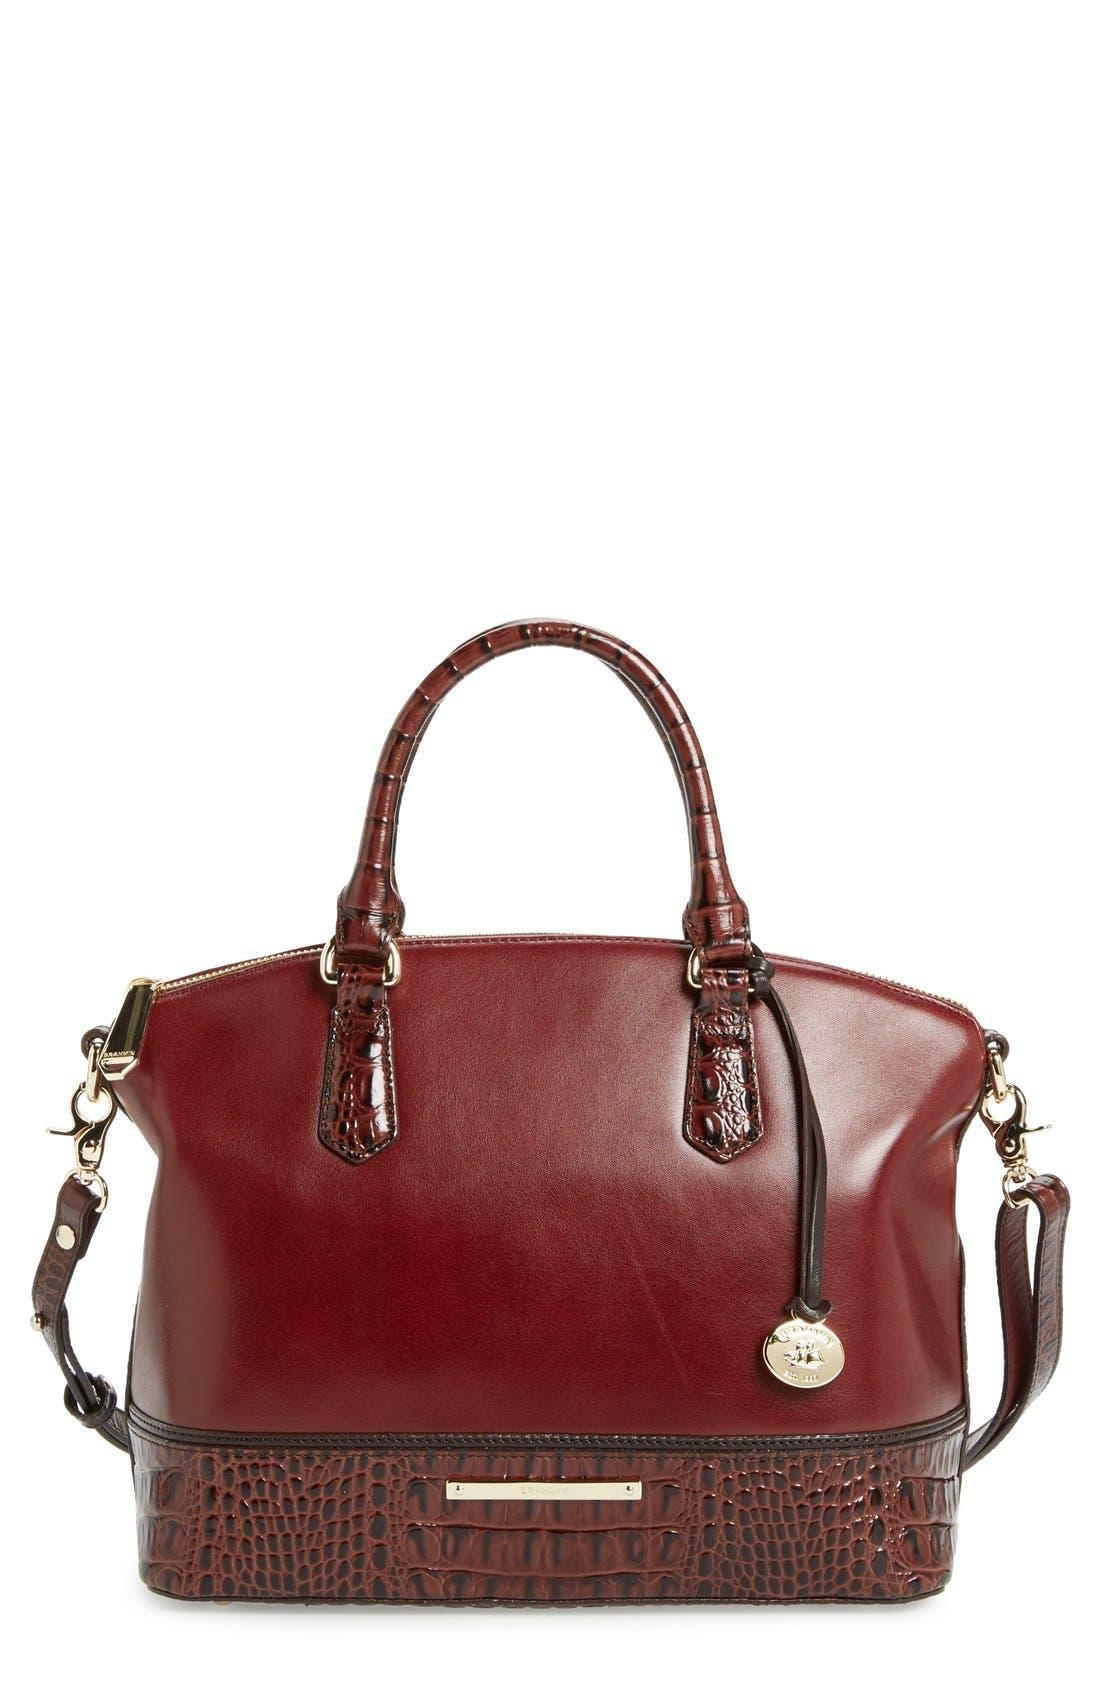 Main Image - Brahmin 'Duxbury' Leather Satchel